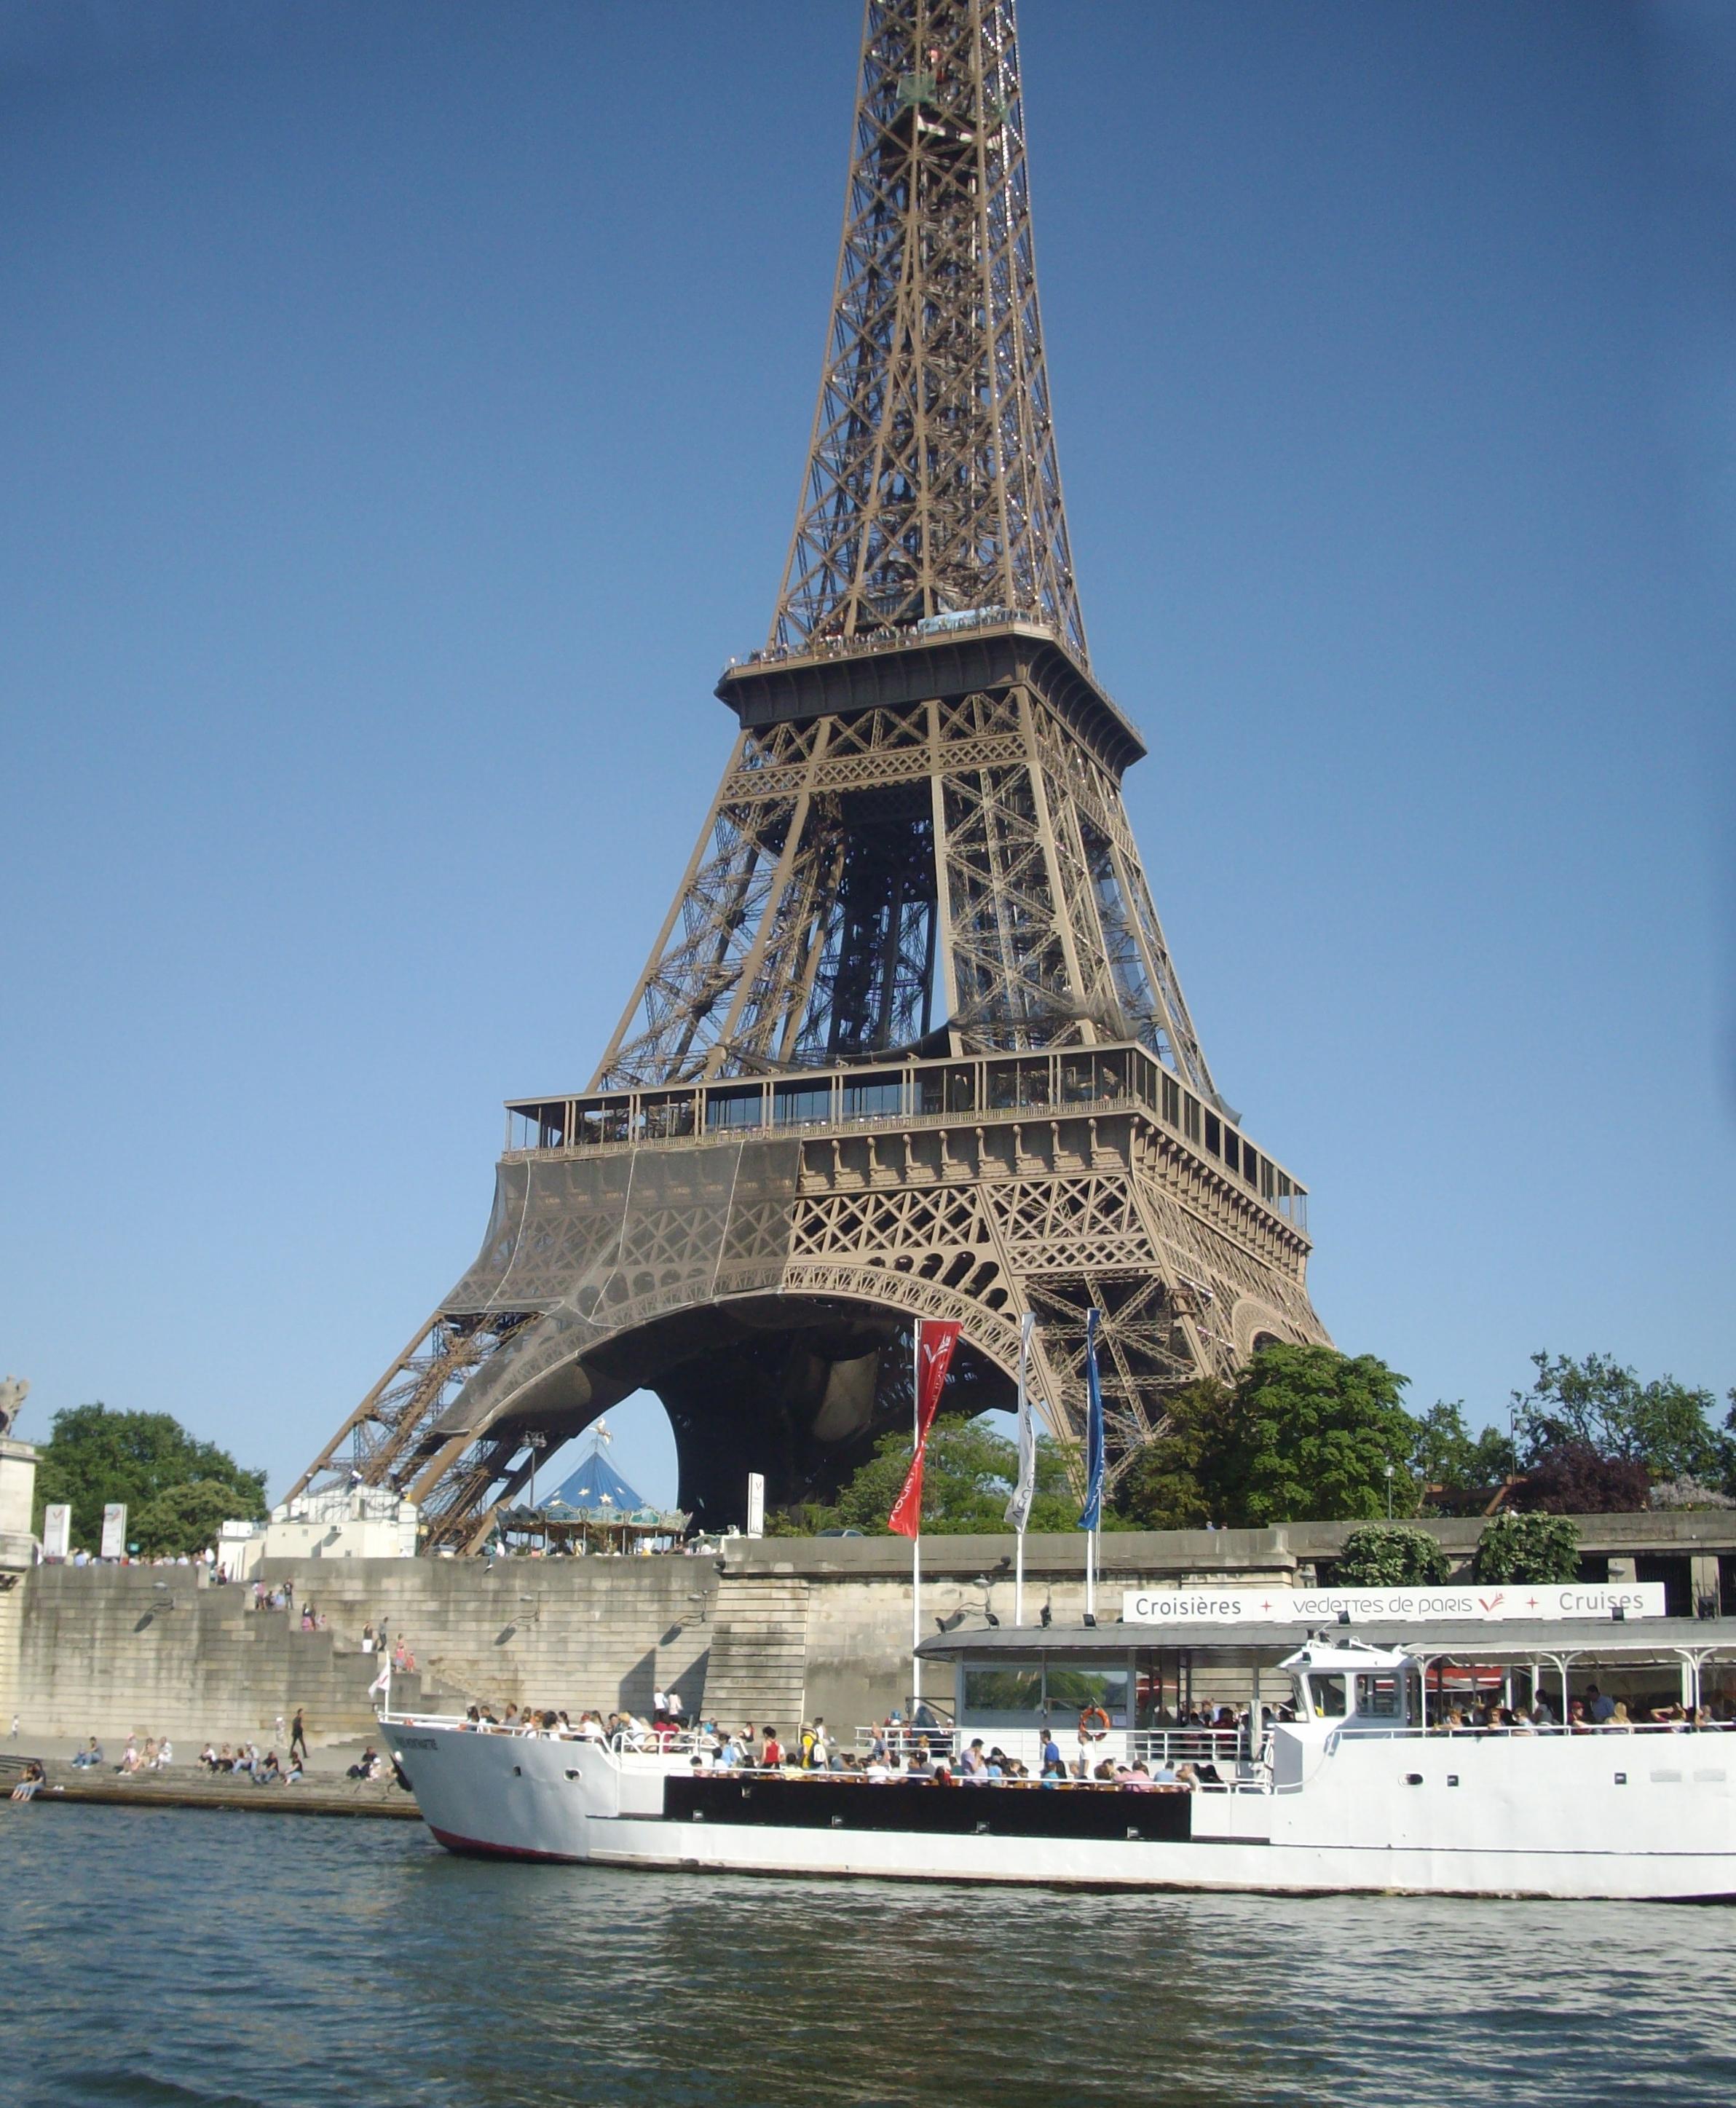 The Seine River Tour